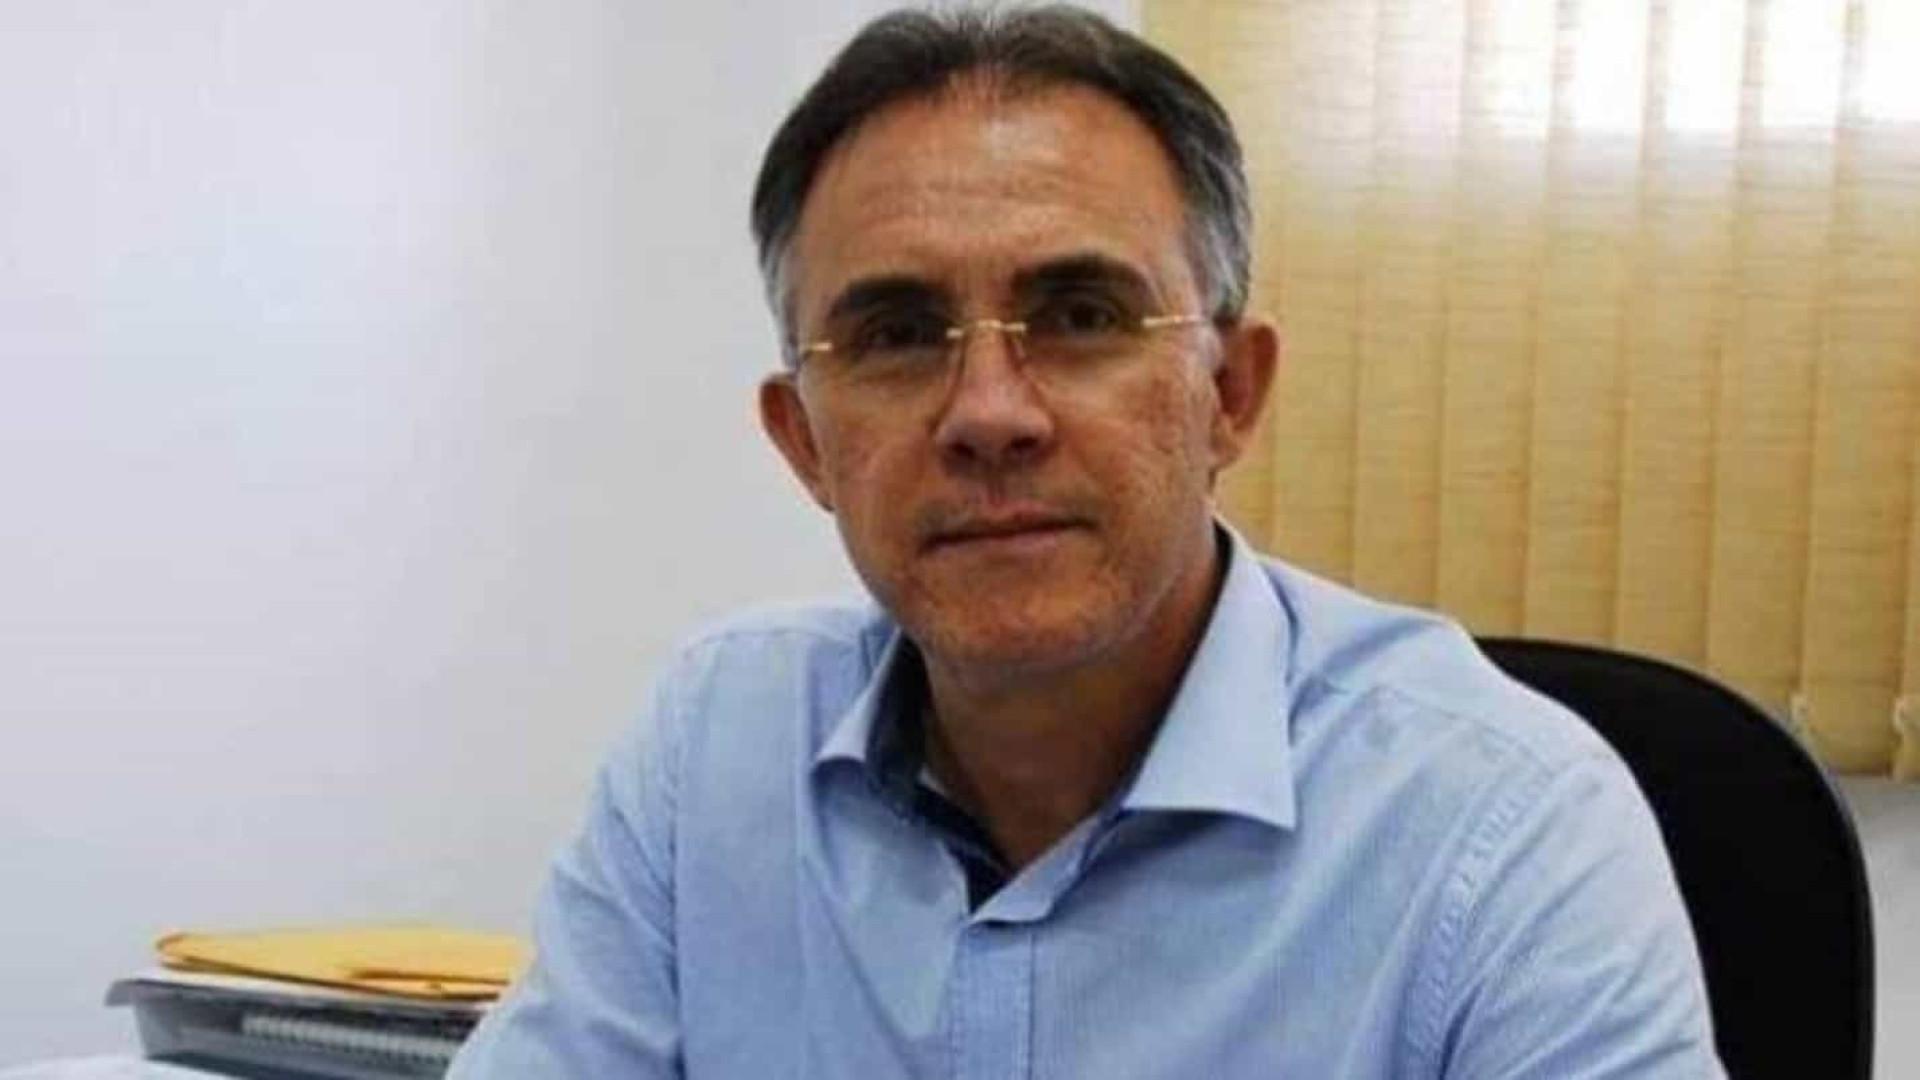 Presidente do Nacional-PR é esfaqueado por ex-jogador do clube